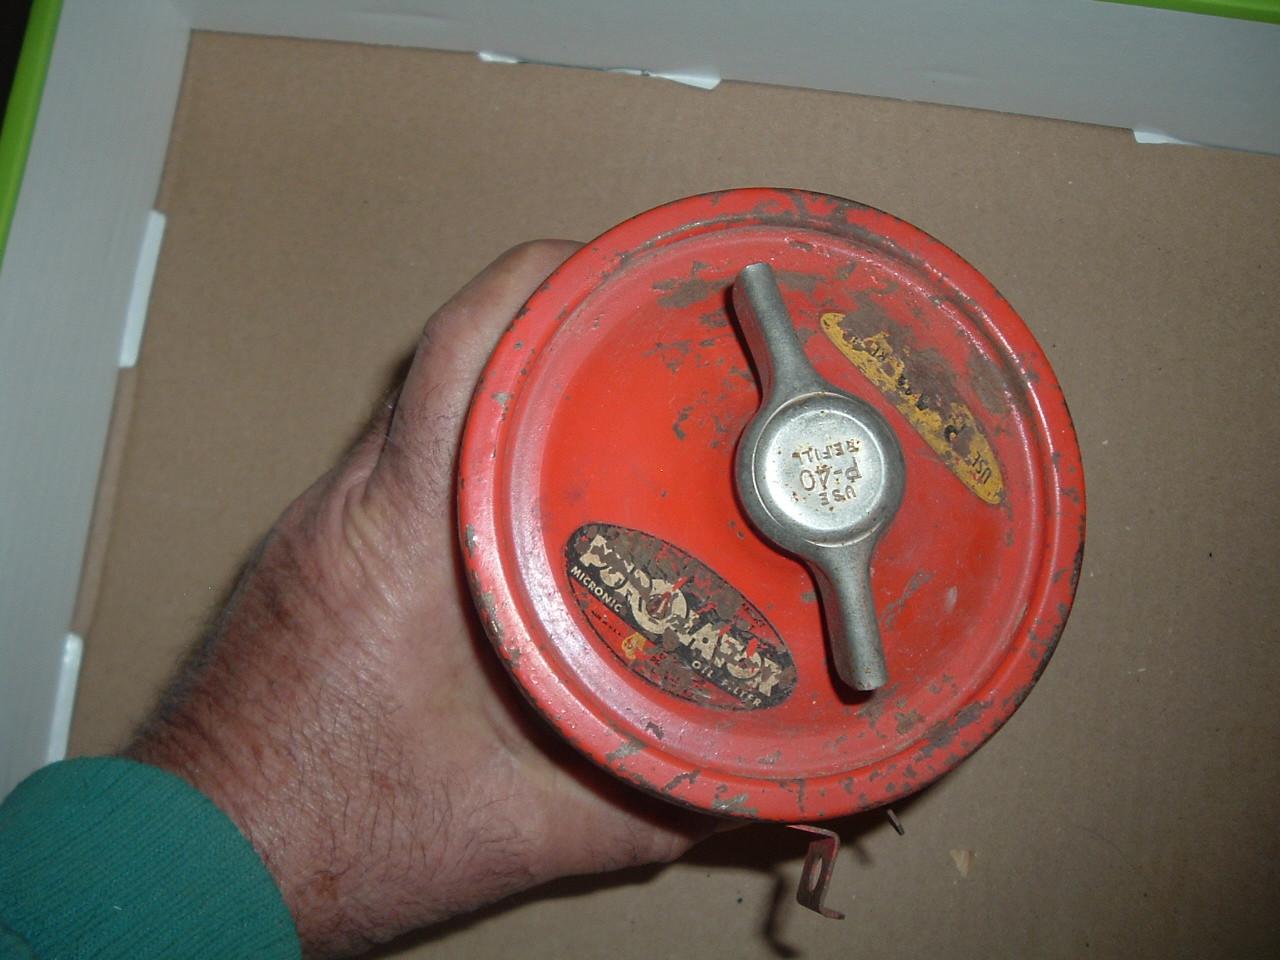 Nash remote oil filter new purolator 1941 42 46 47 48 49 ambassador & 600 era (1) (z p434)